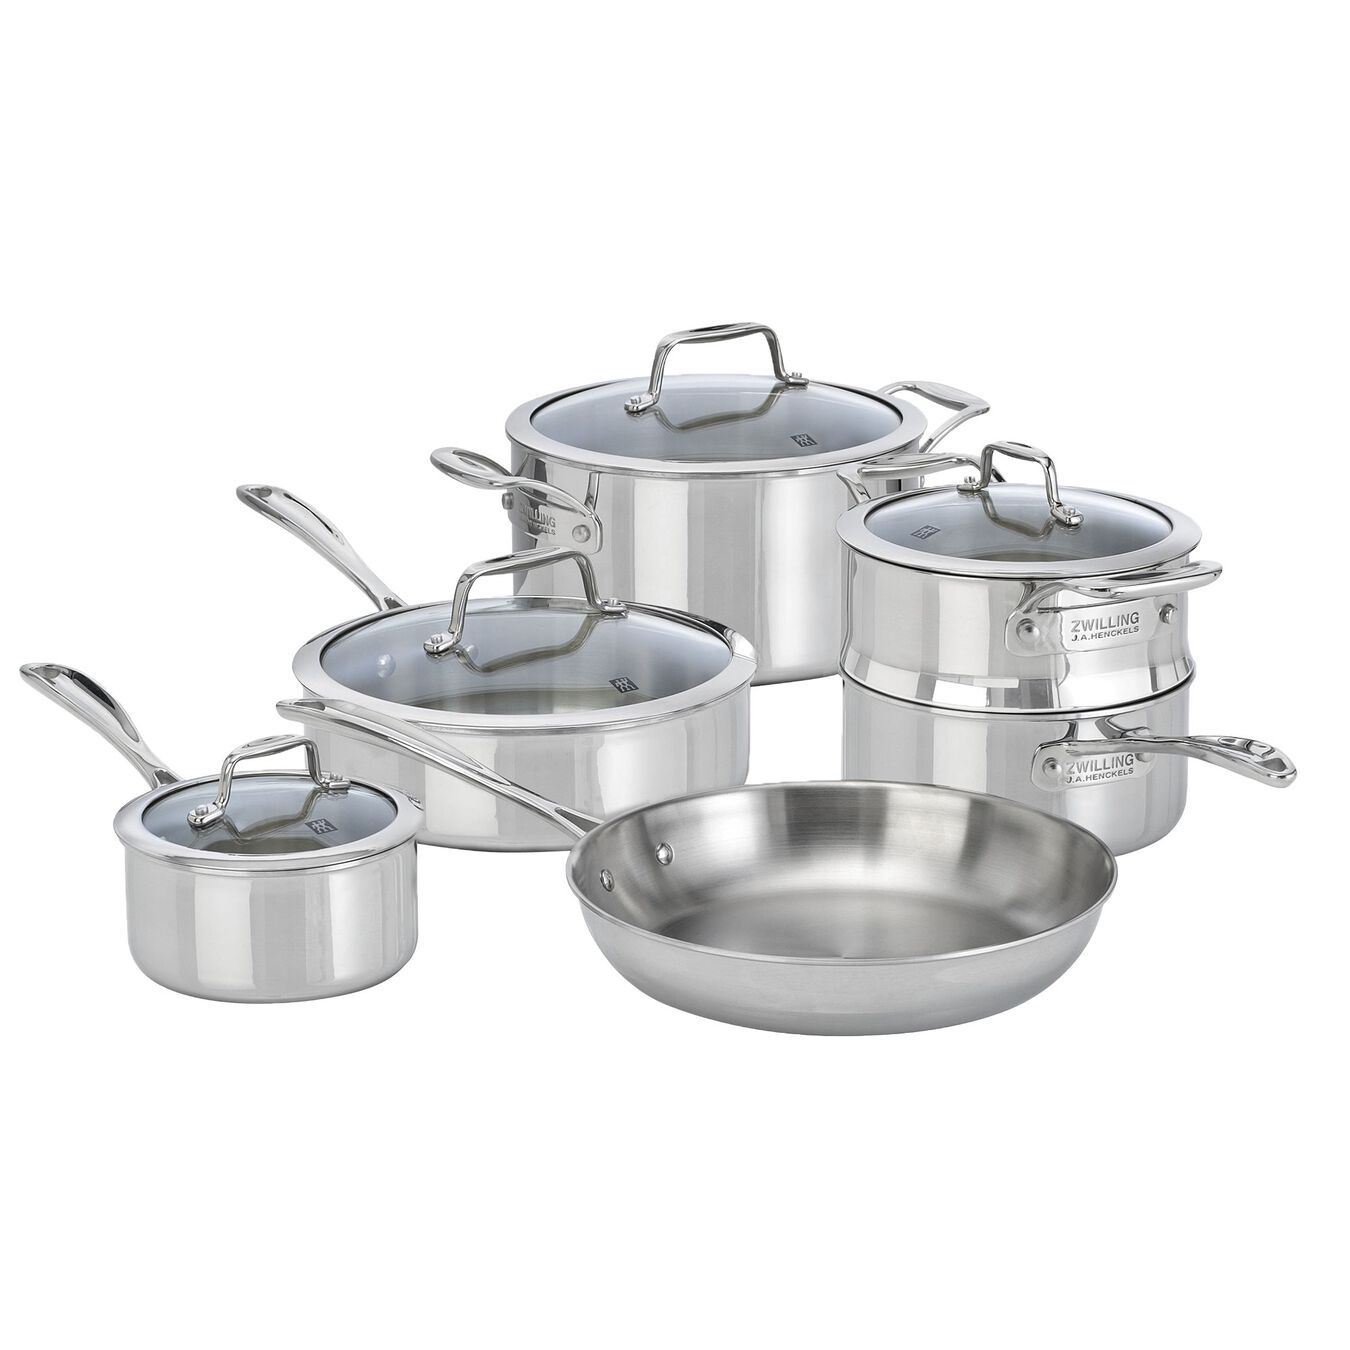 10 Piece cookware set with bonus non-stick frypan,,large 1